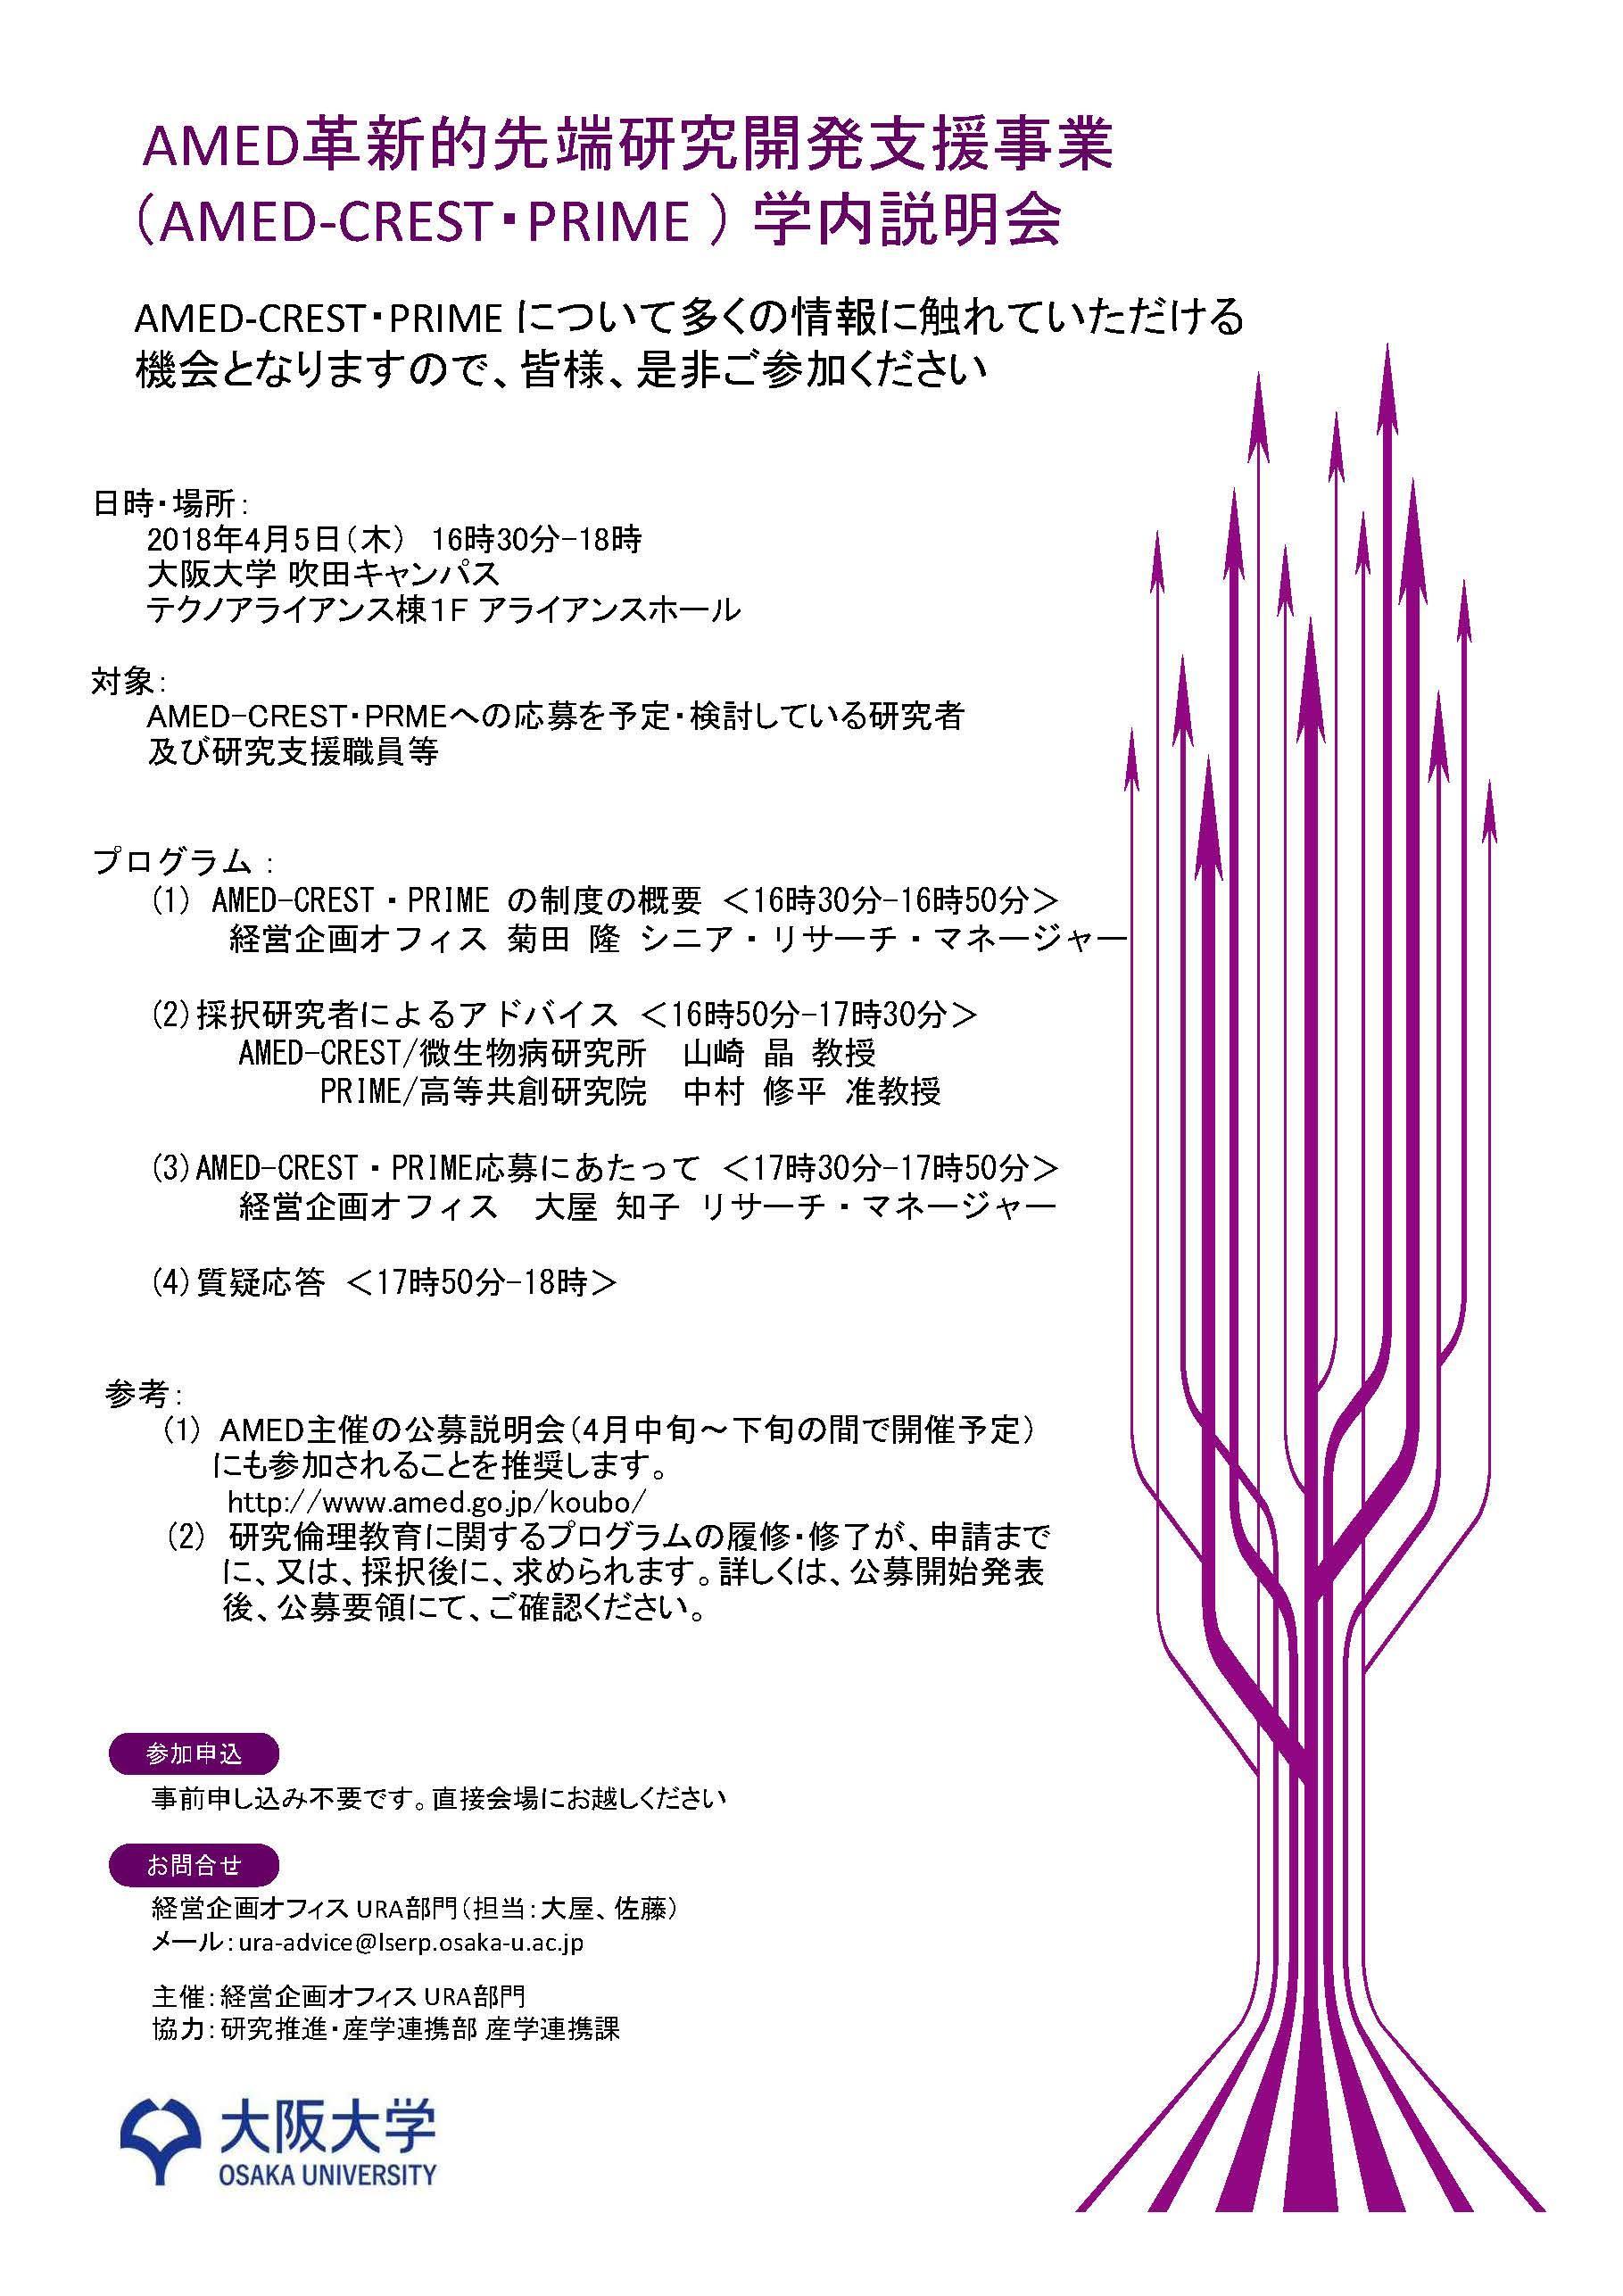 H30AMED-CREST・PRIME 学内説明会.jpg